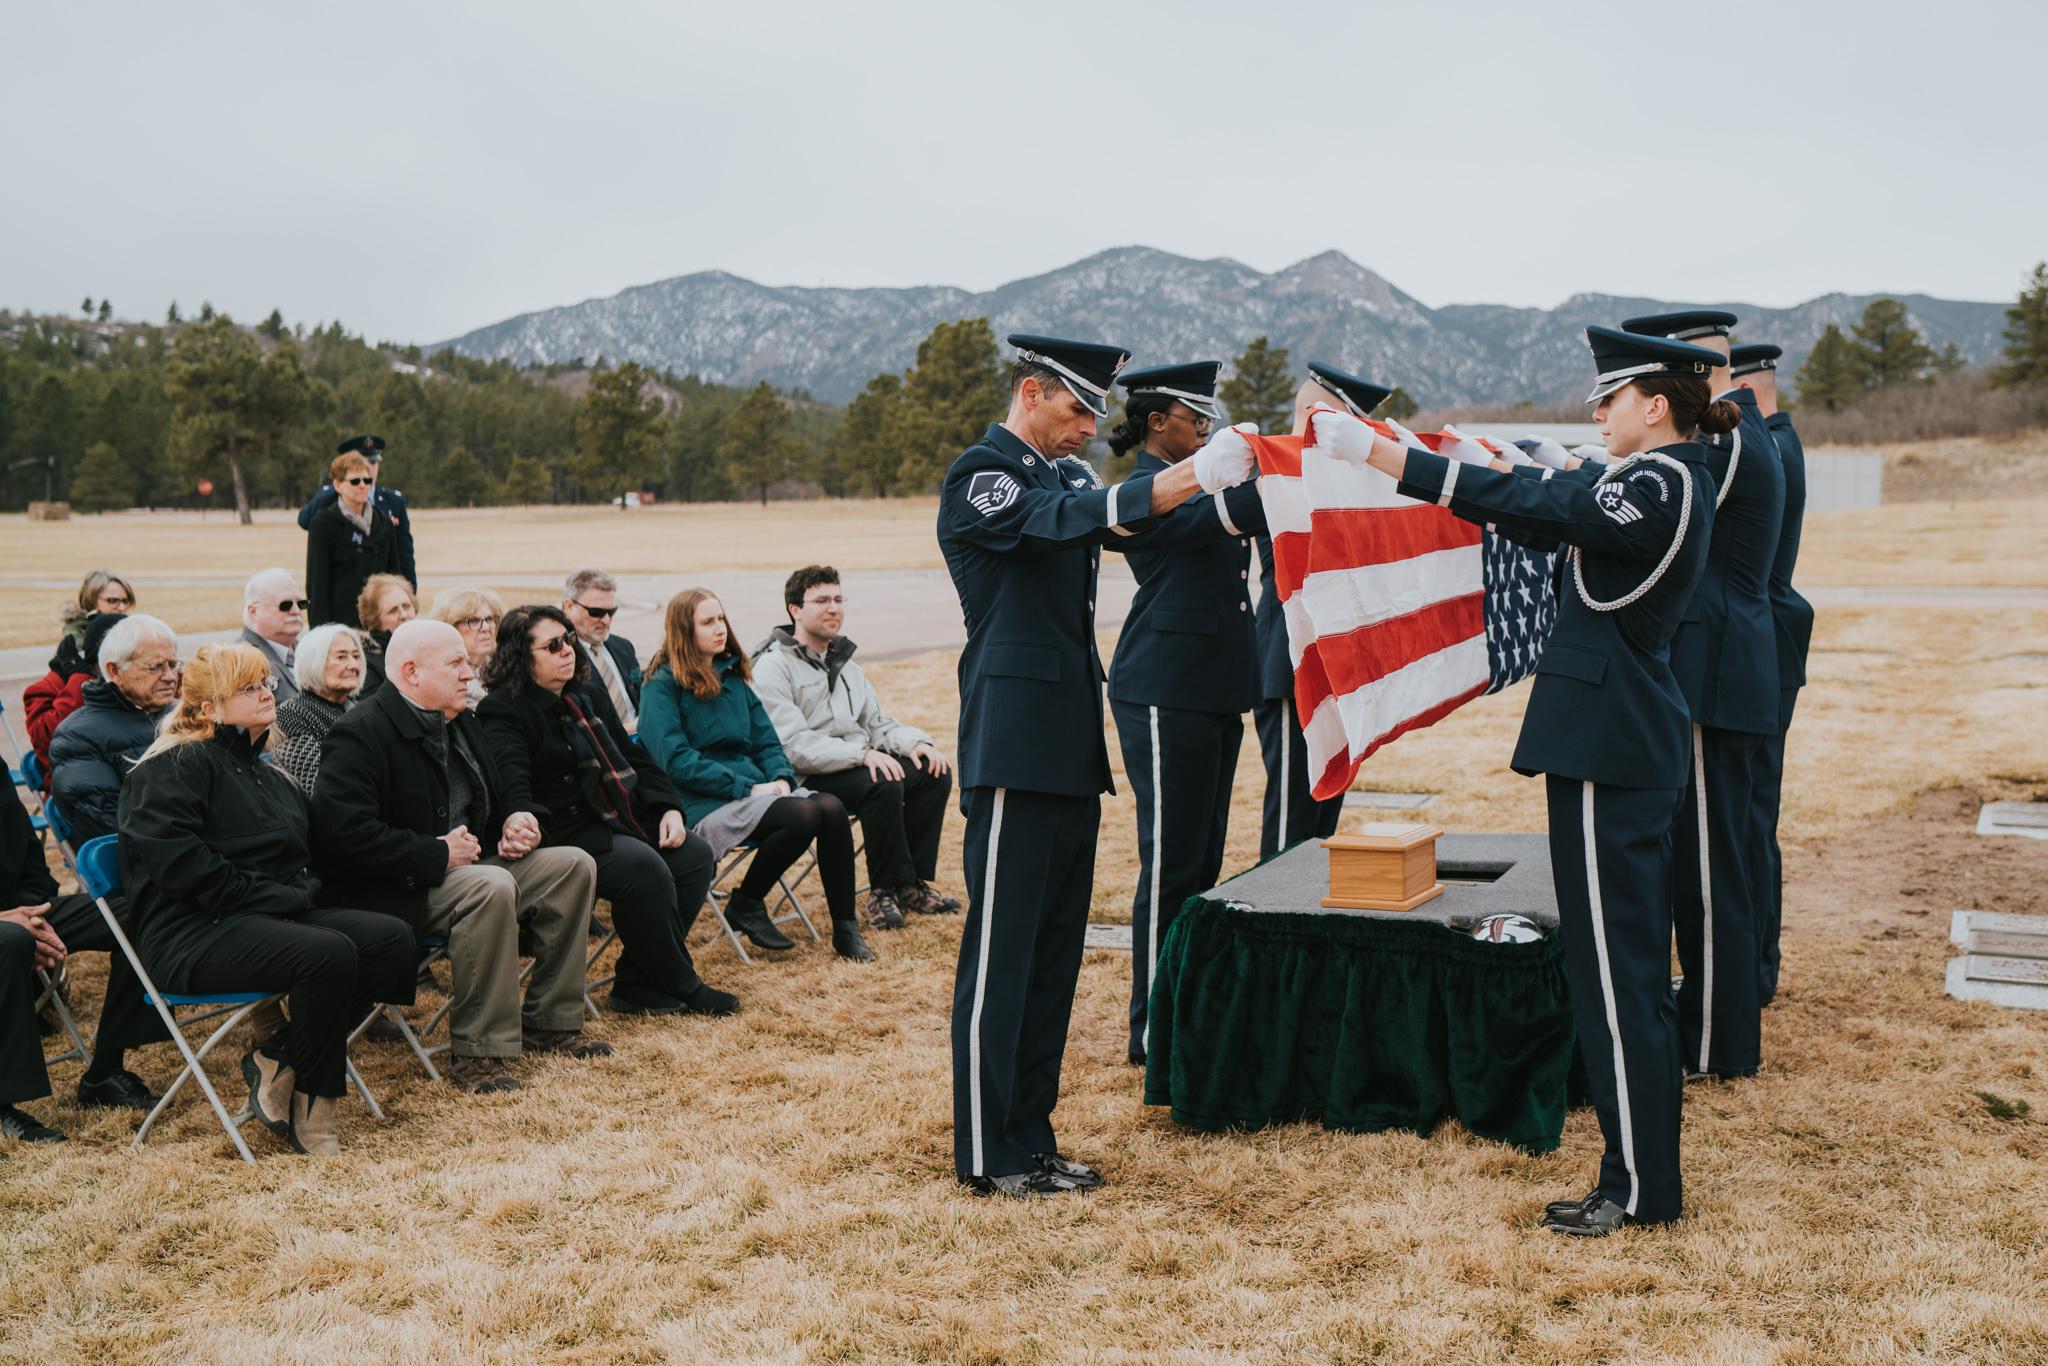 usafa-colorado-military-honours-burial-funeral-photography-grace-elizabeth-colchester-essex-alternative-wedding-lifestyle-photographer (40 of 127).jpg